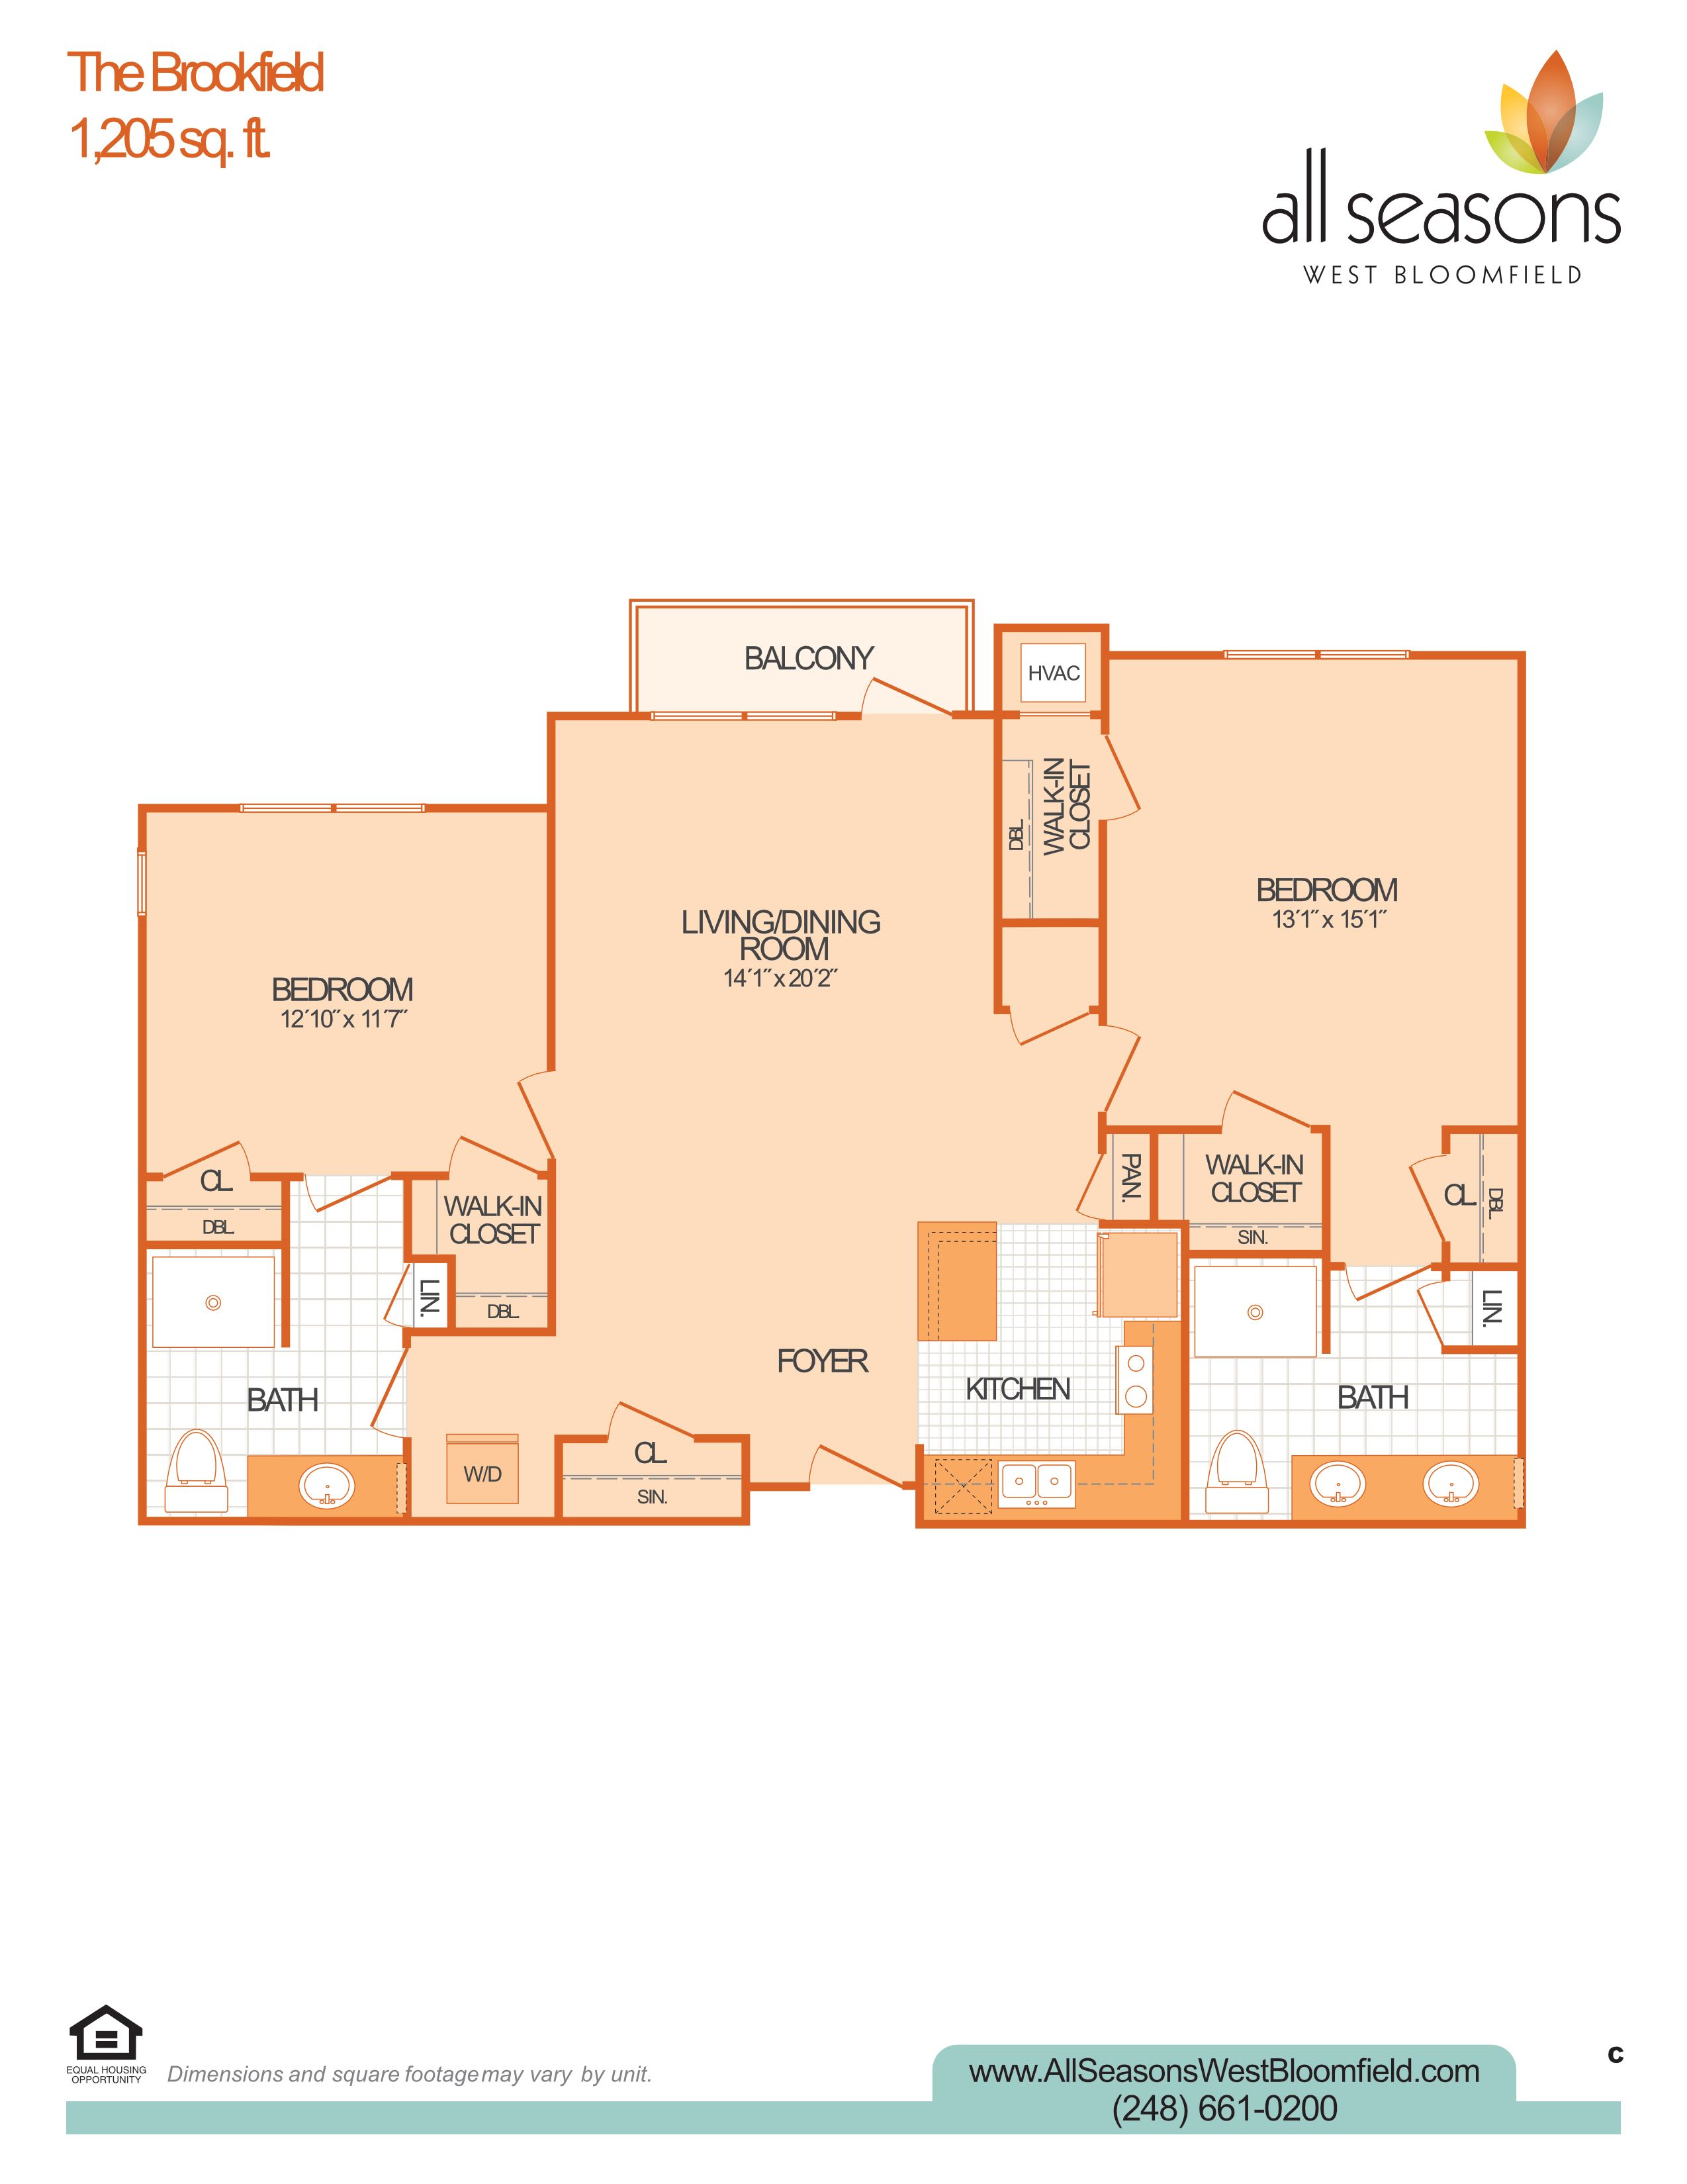 The Brookfield floor plan at All Seasons West Bloomfield in West Bloomfield, Michigan